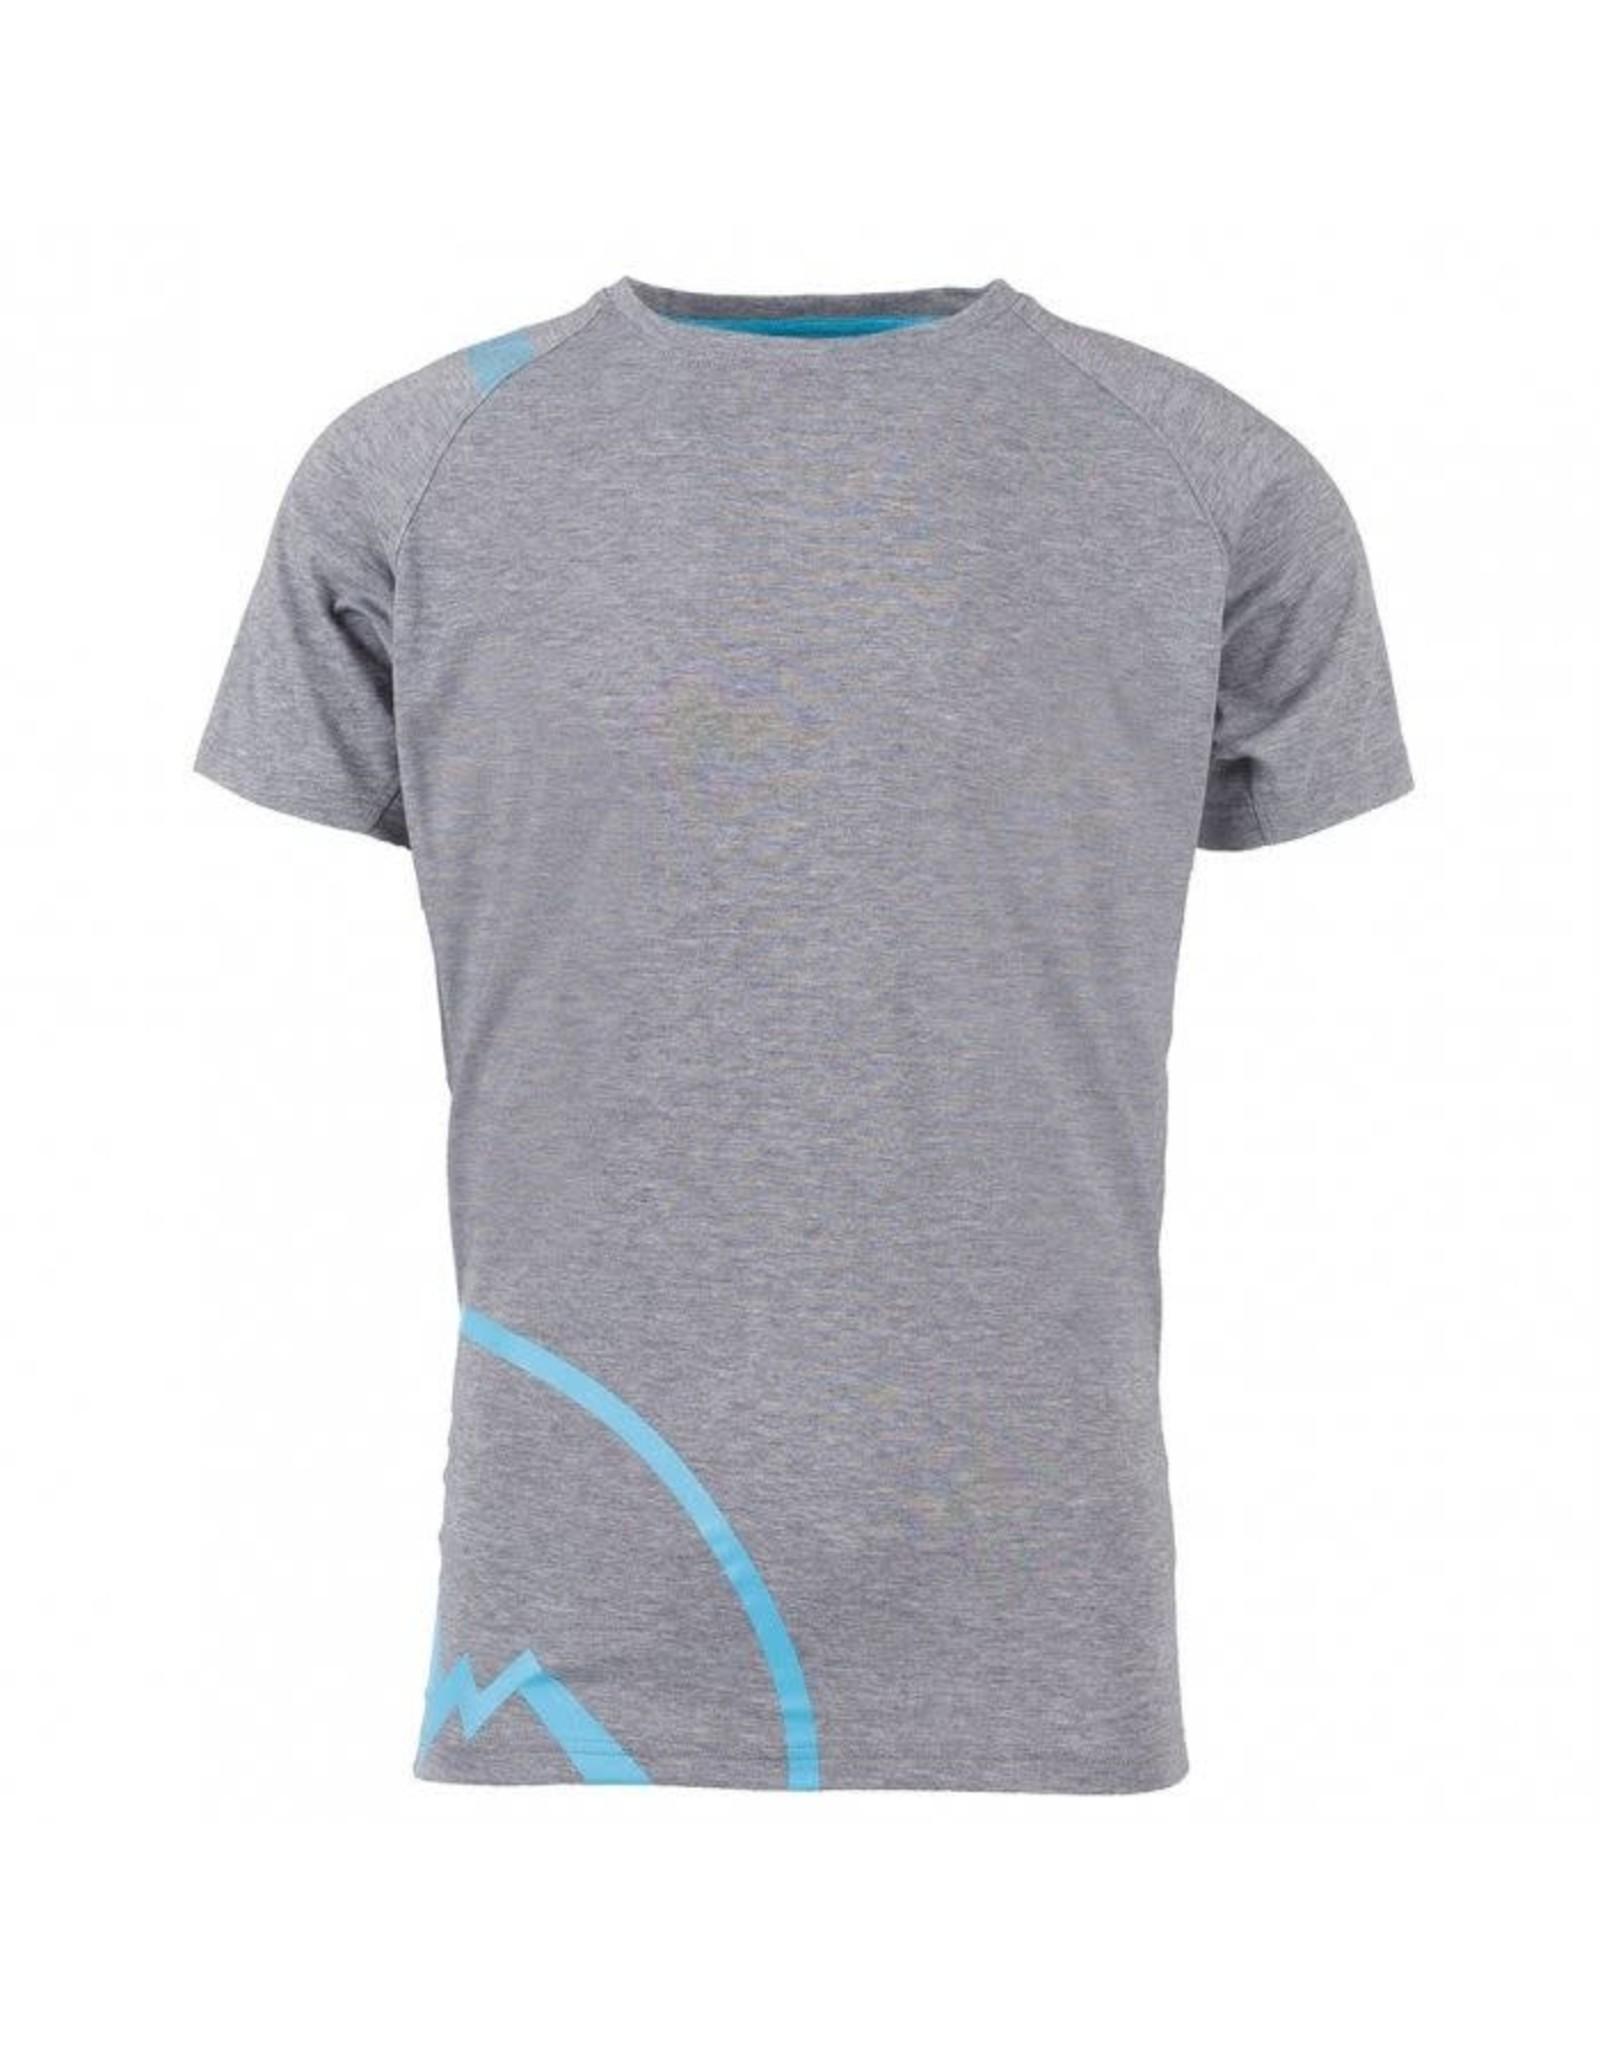 La Sportiva T-shirt La Sportiva Santiago - Homme